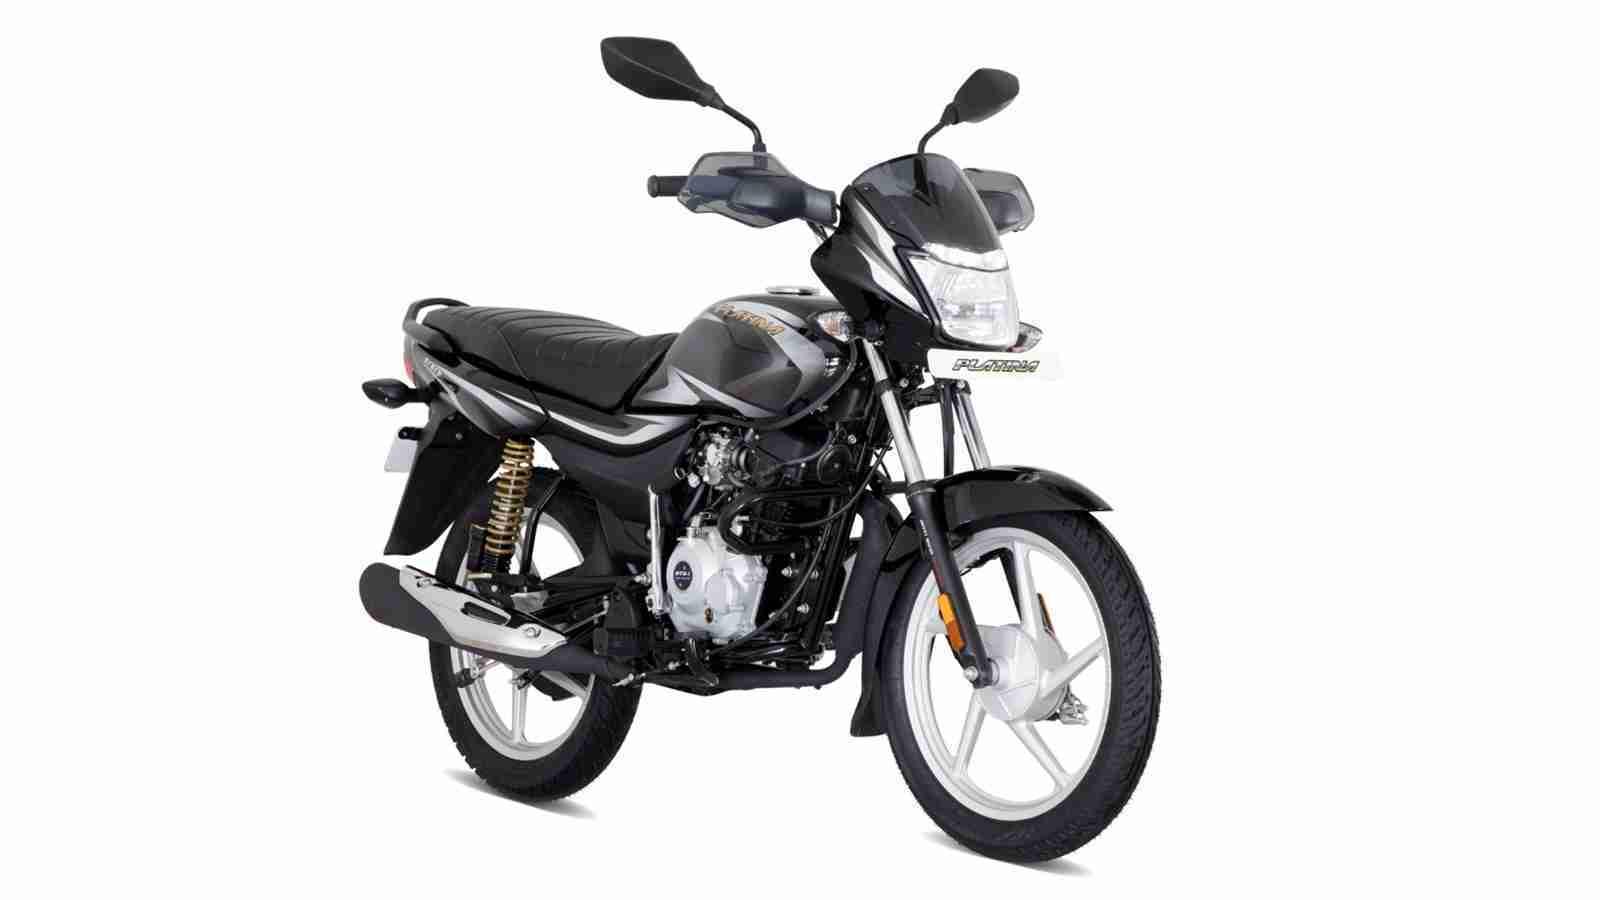 New Bajaj Platina 100KS - Ebony black with silver decals colour option